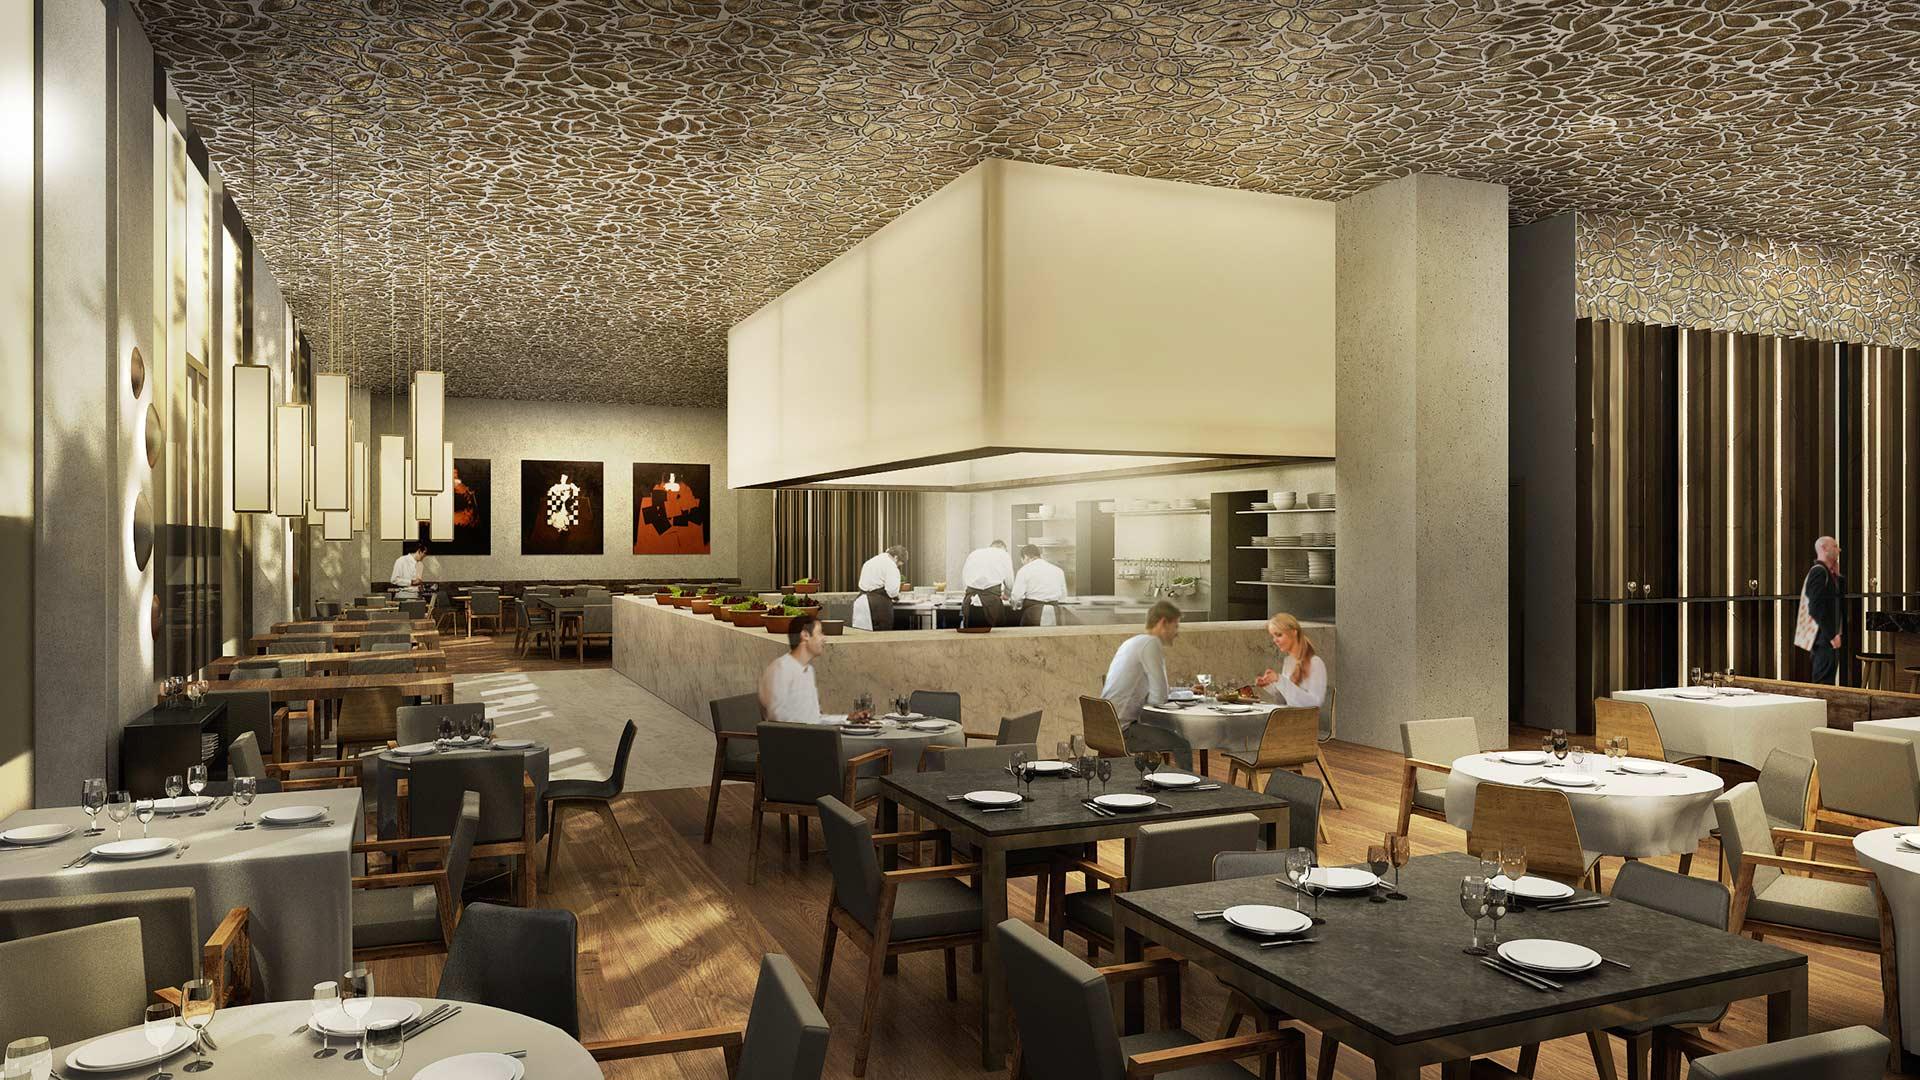 La Luz Restaurant